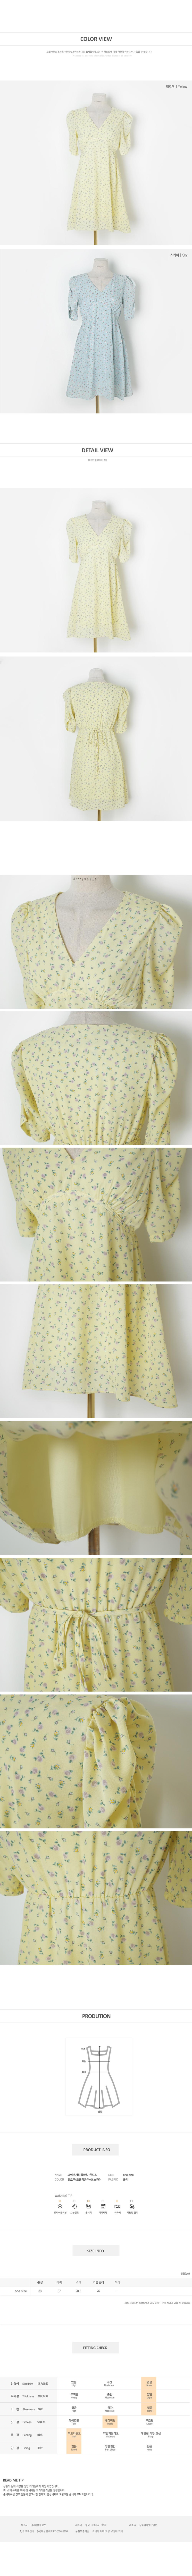 Vine Shirring Flower Dress